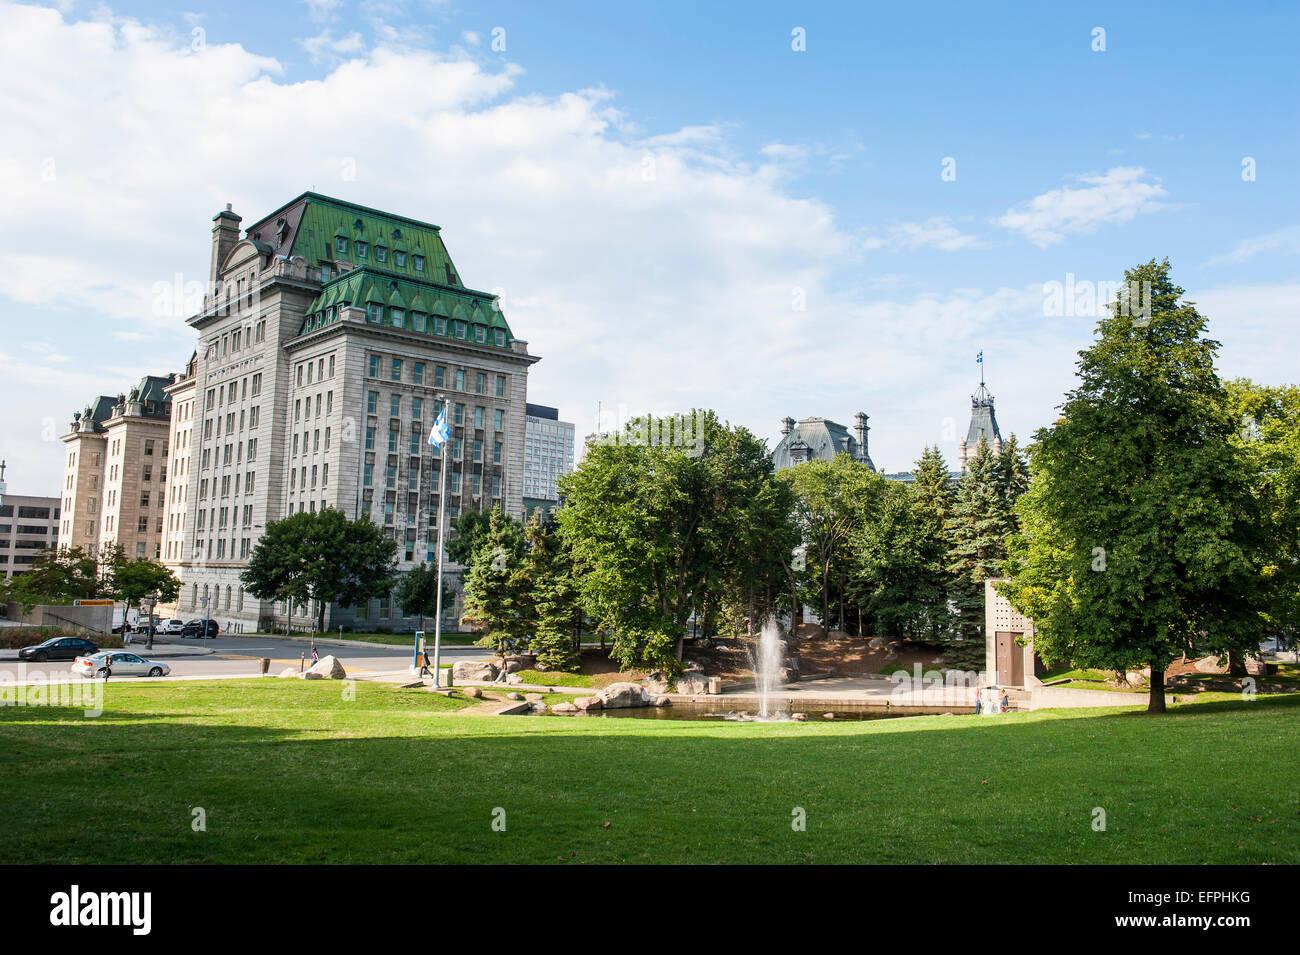 Park in Quebec Stadt, Quebec, Kanada, Nordamerika Stockbild